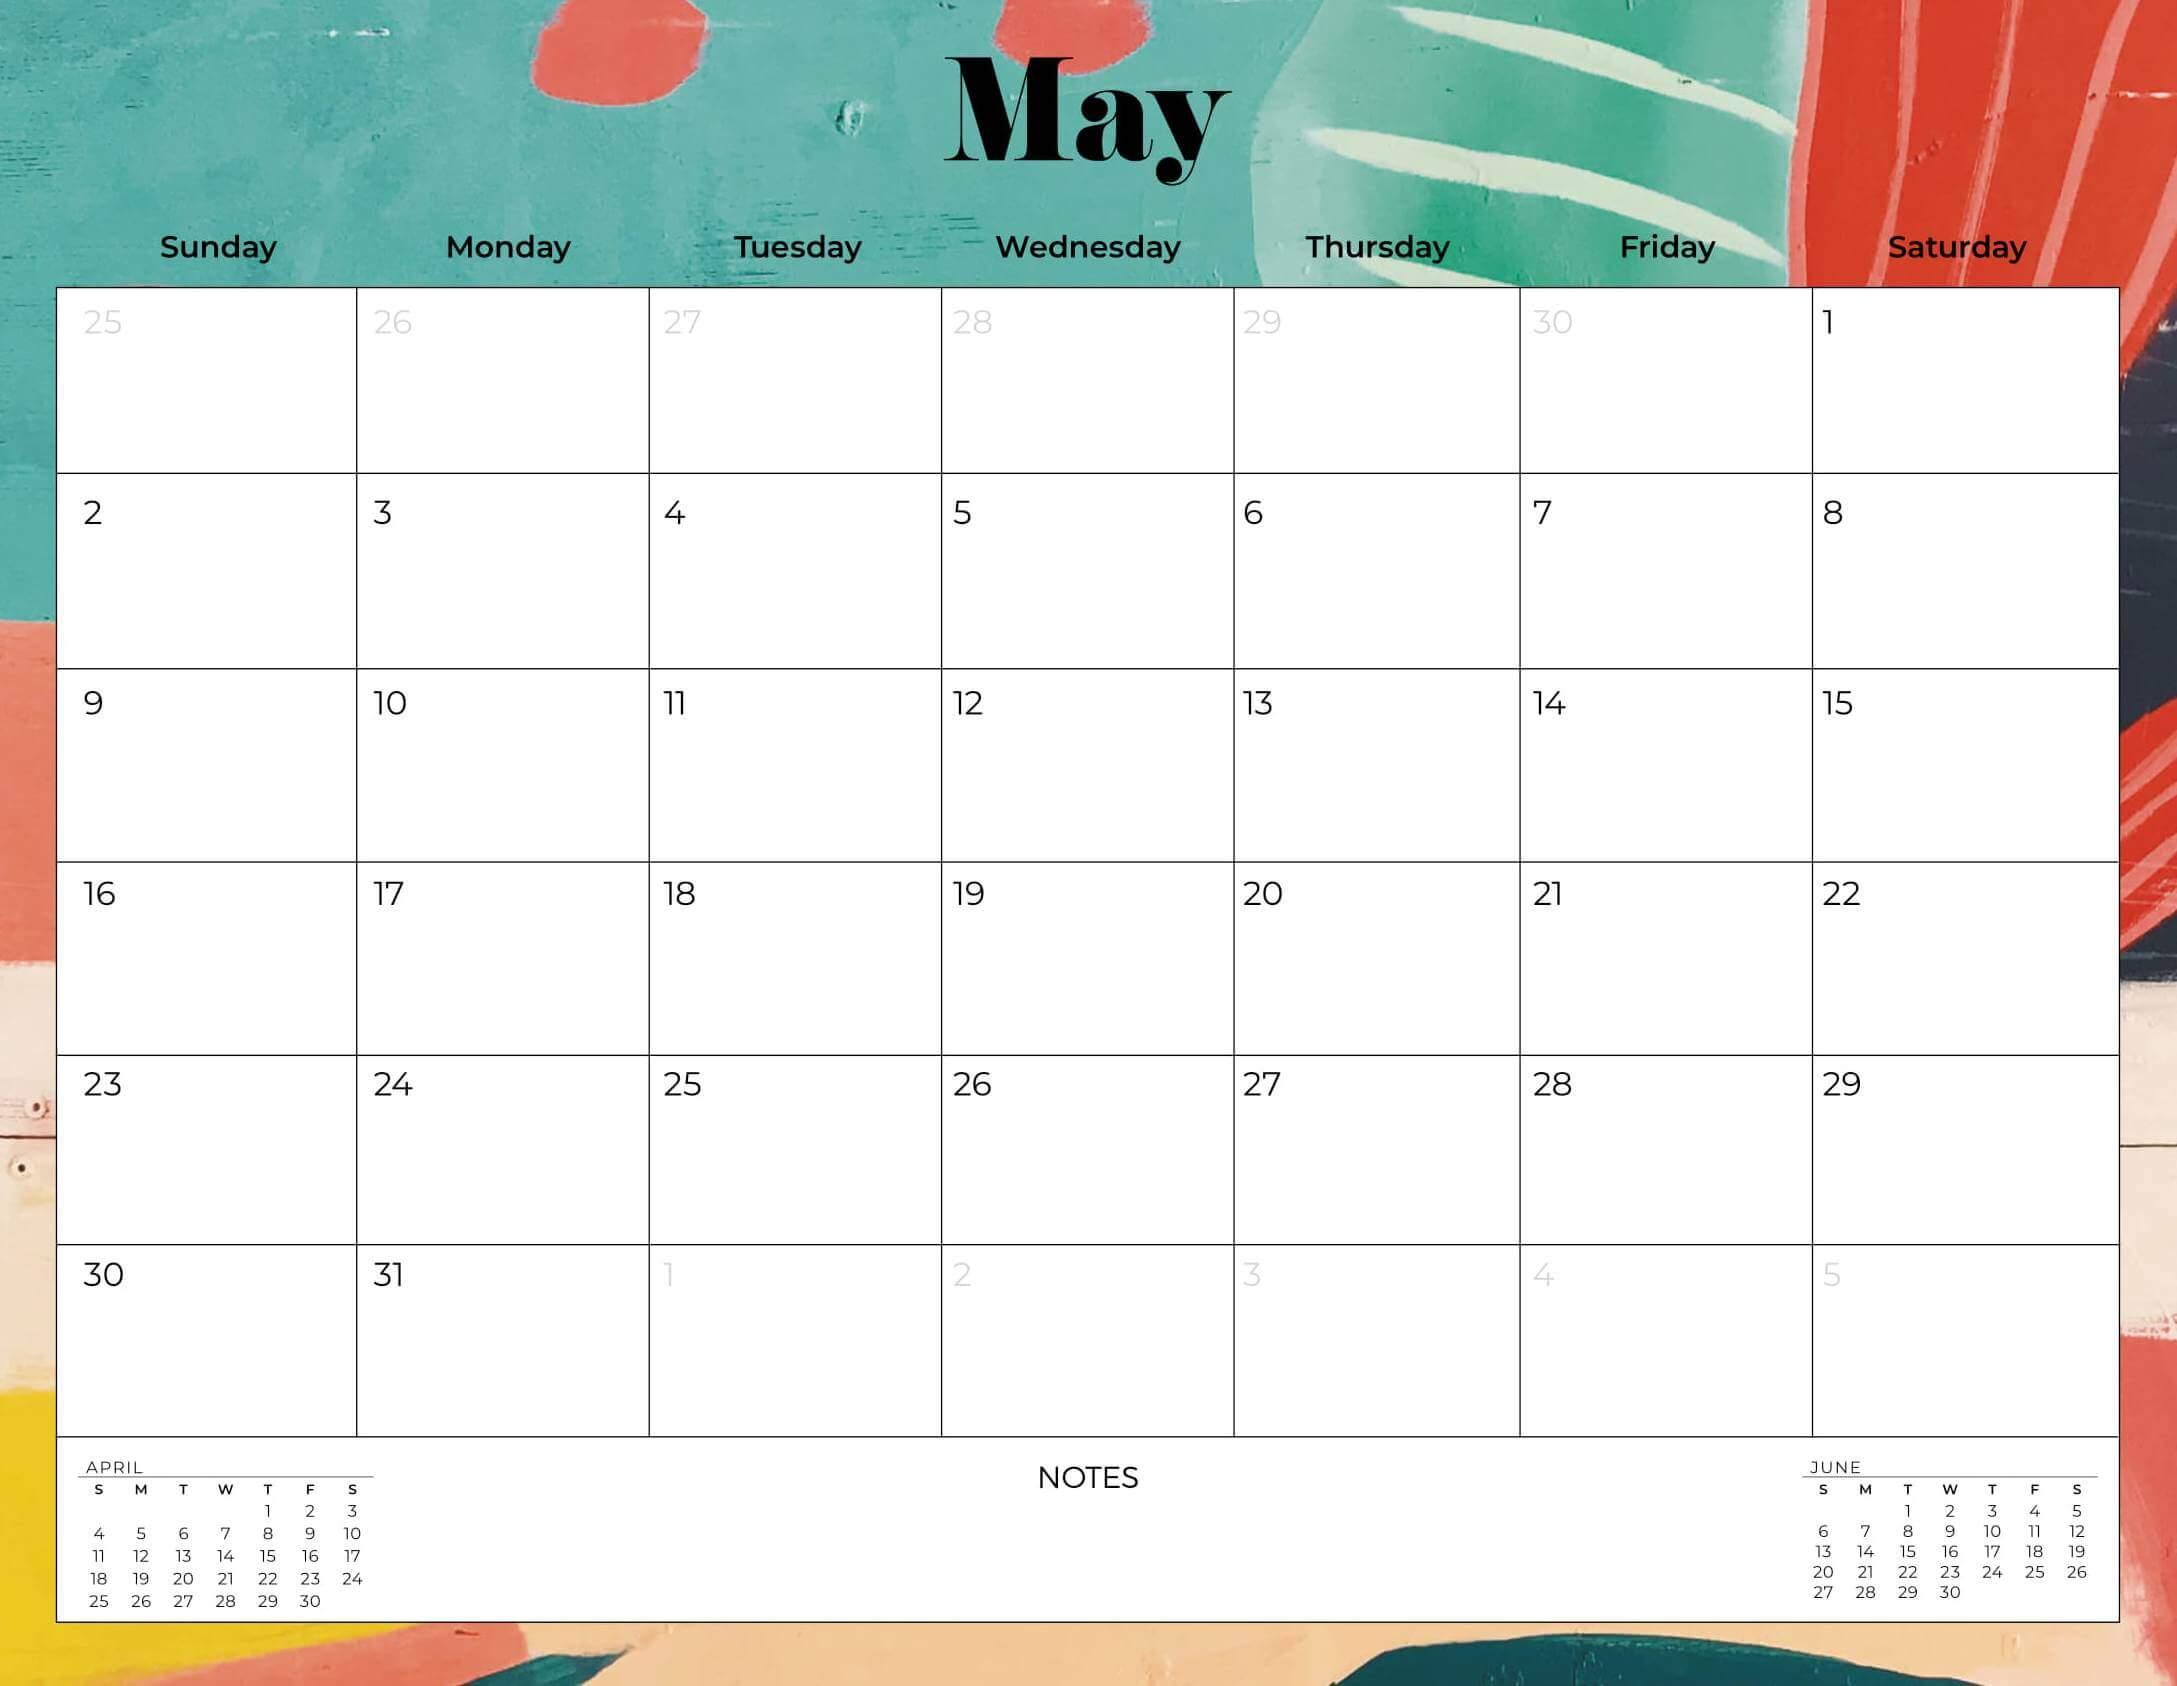 Decorative May 2021 Desk Calendar